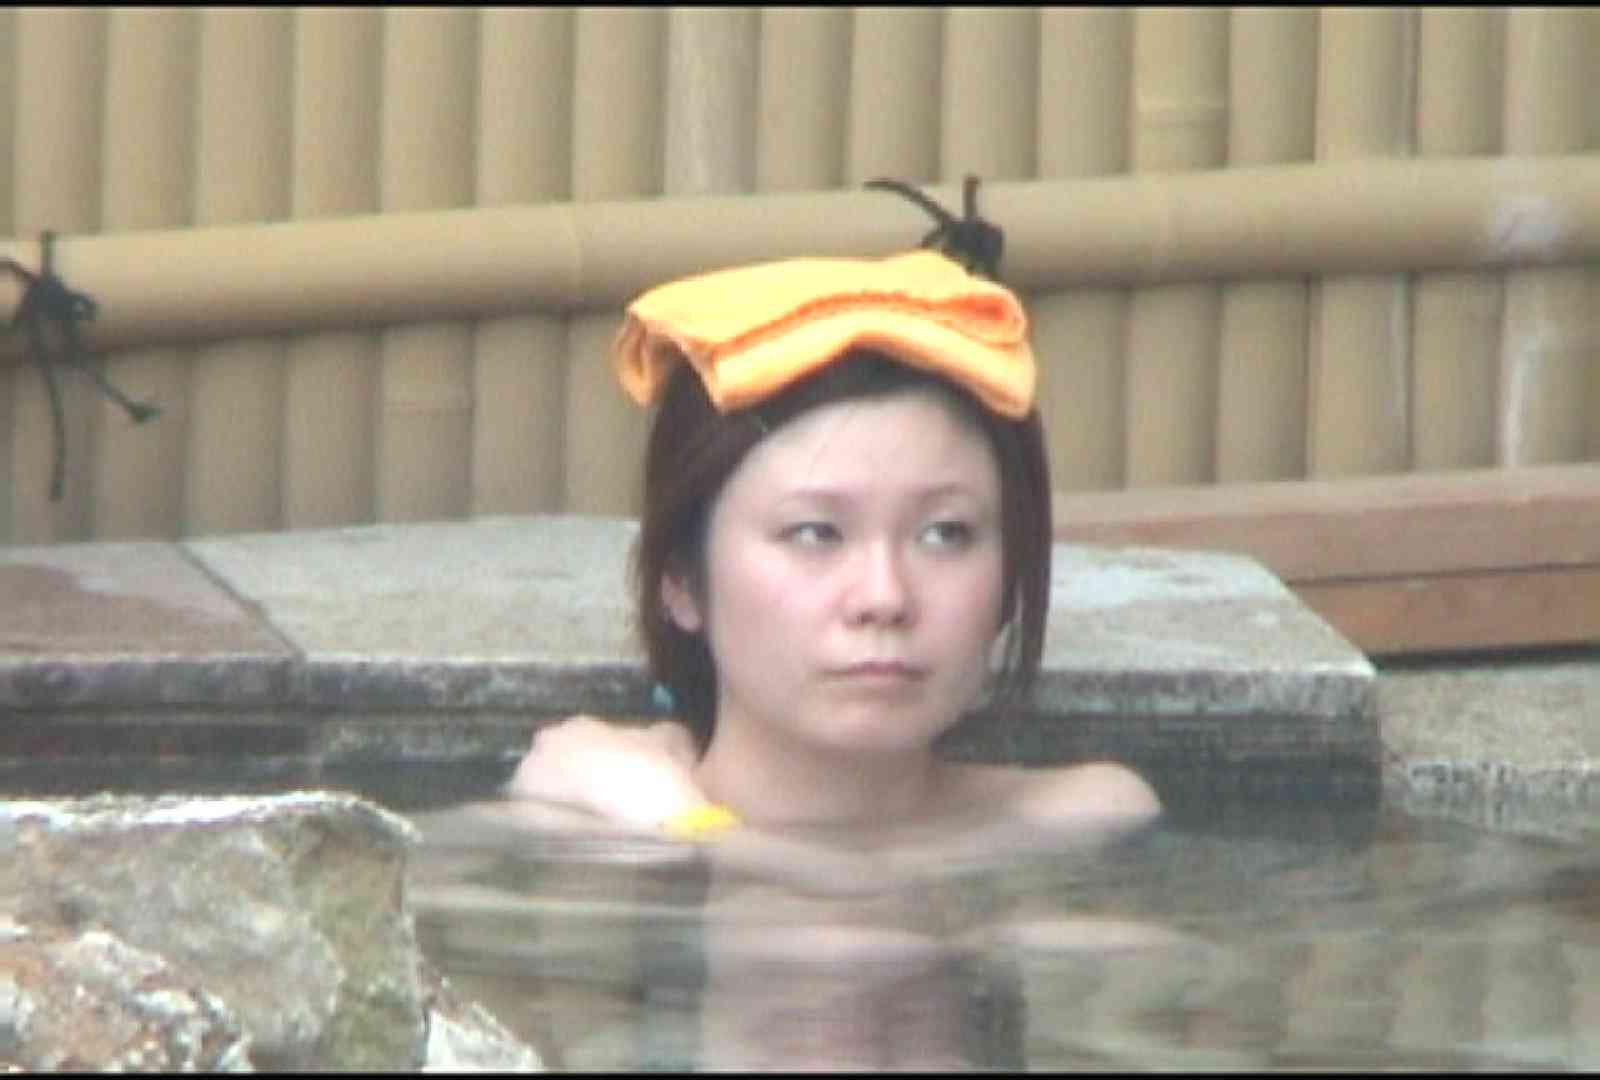 Aquaな露天風呂Vol.177 OLのエロ生活 オマンコ無修正動画無料 40連発 5